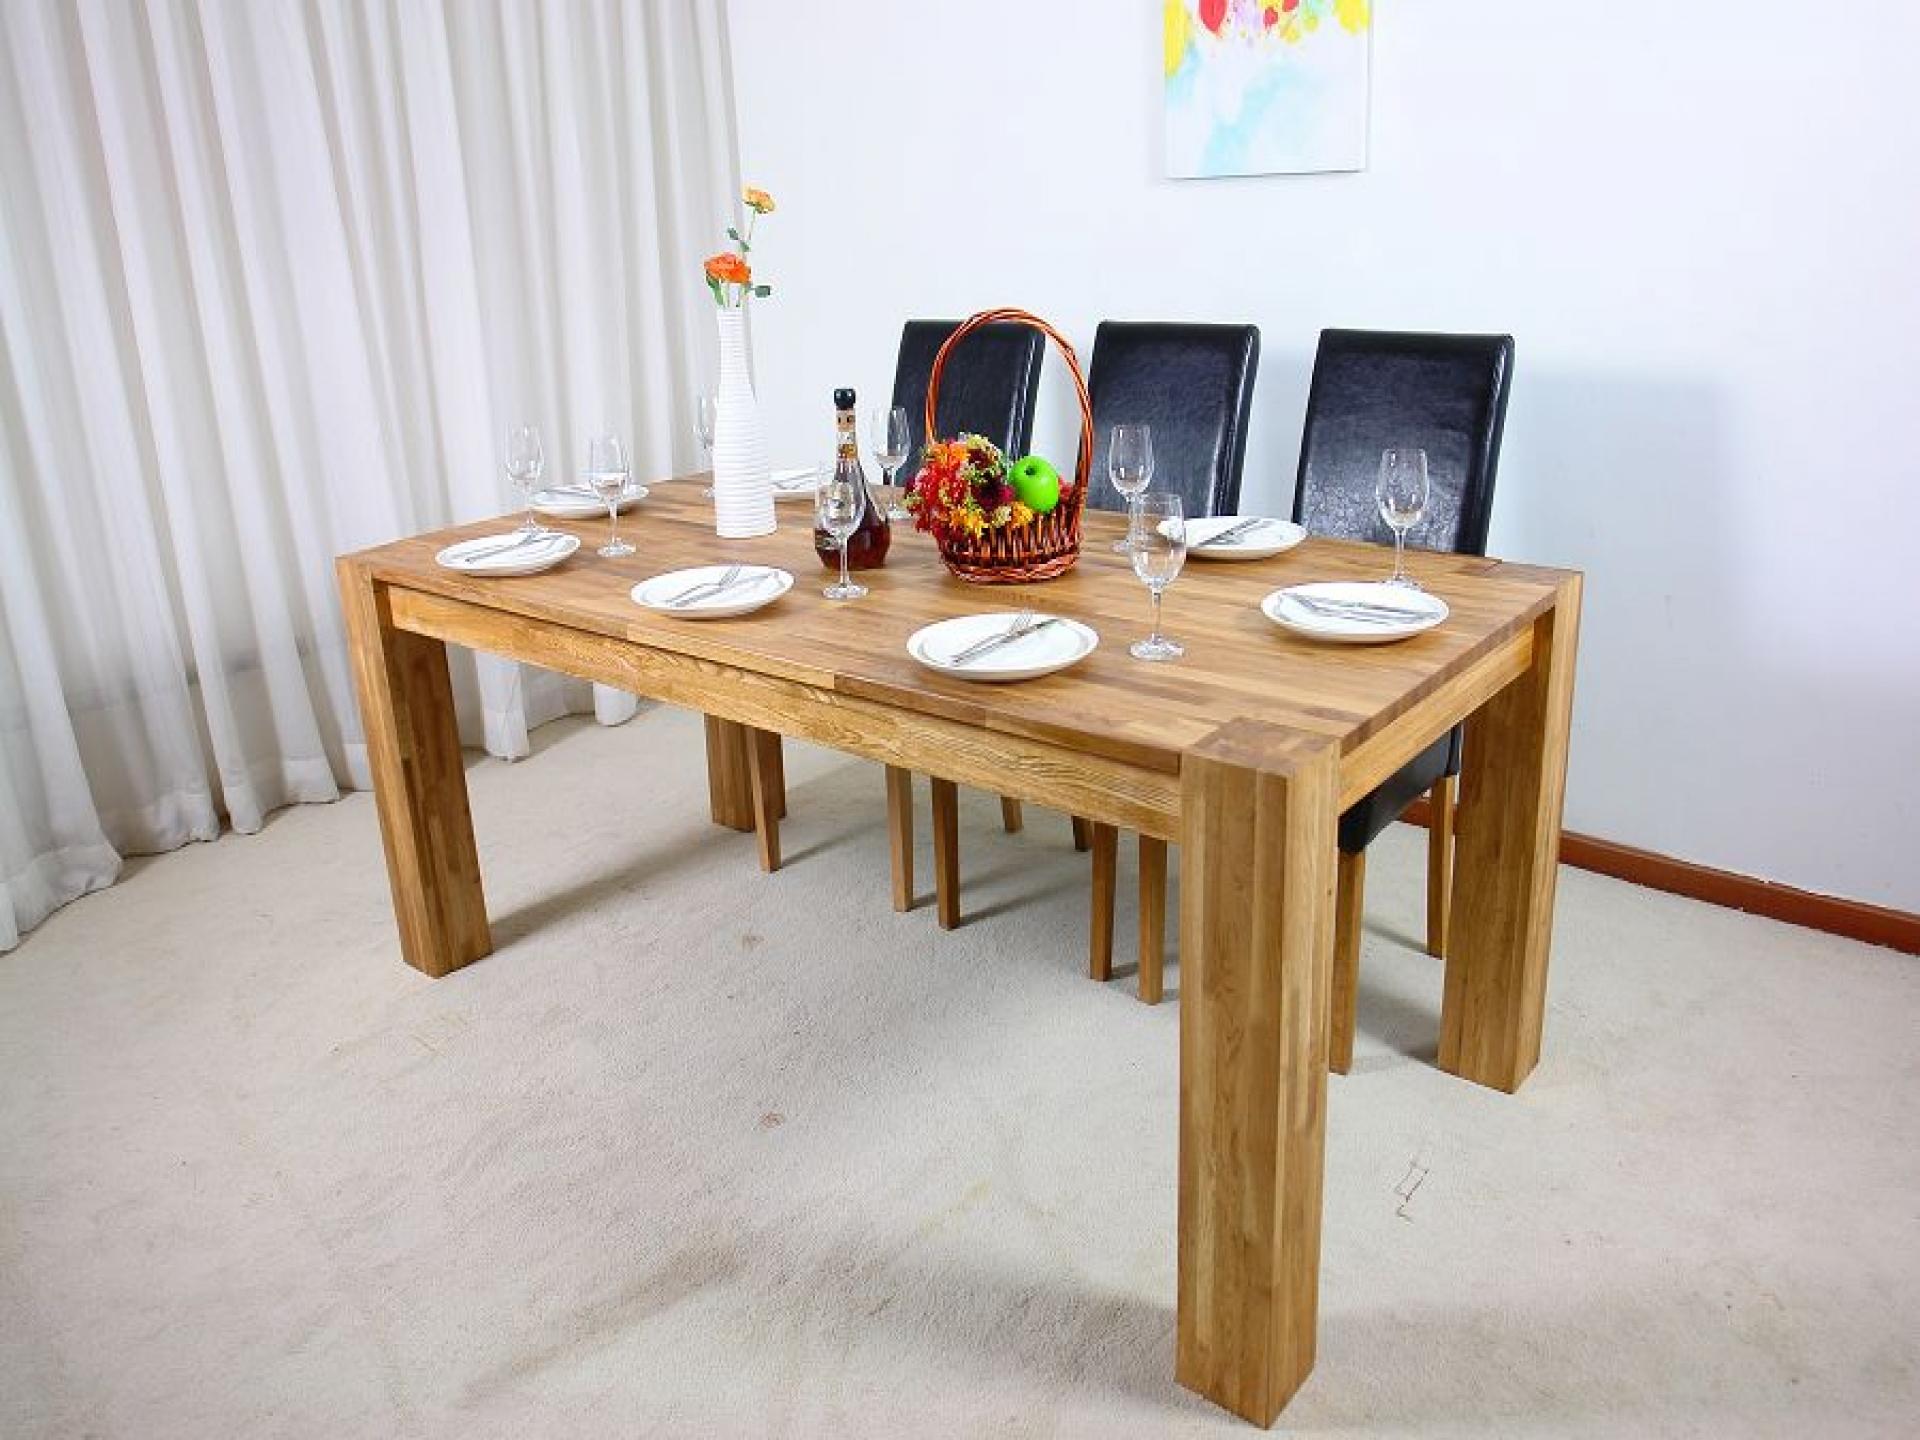 кухонный стол своими руками фото